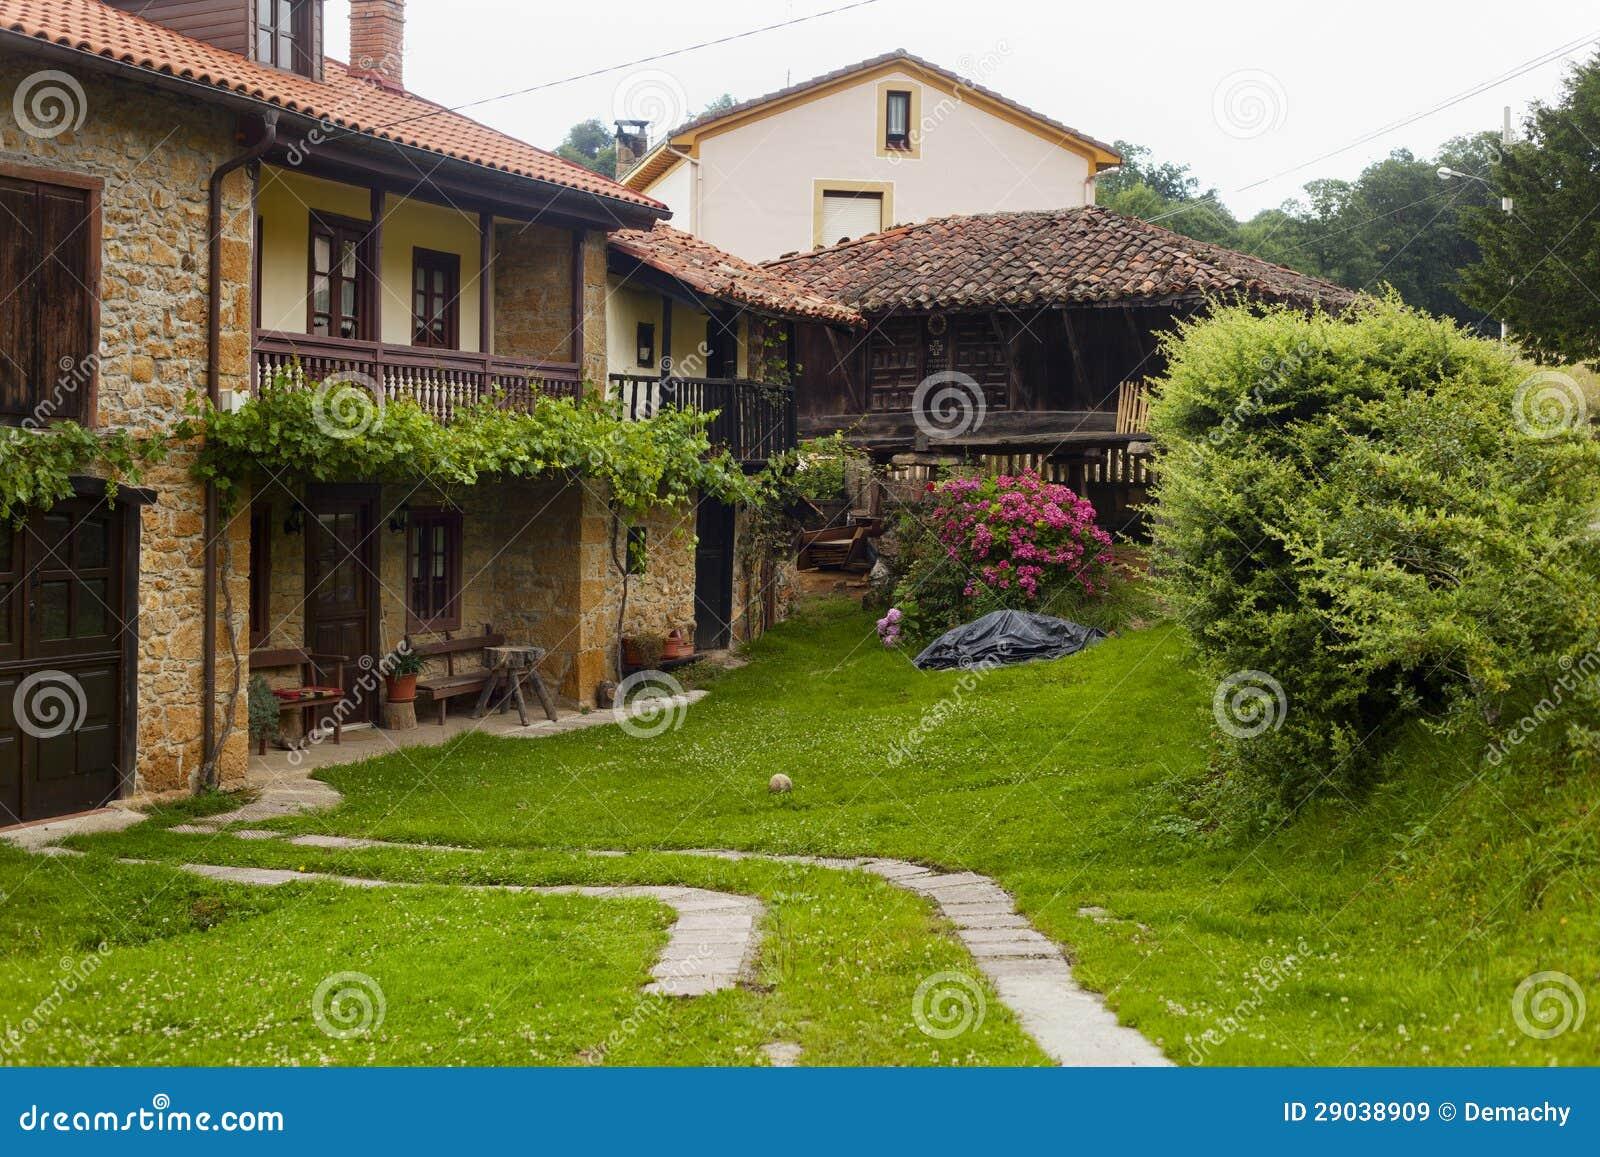 Casas de campo espanholas bonitas imagens de stock royalty - Casas de campo bonitas ...